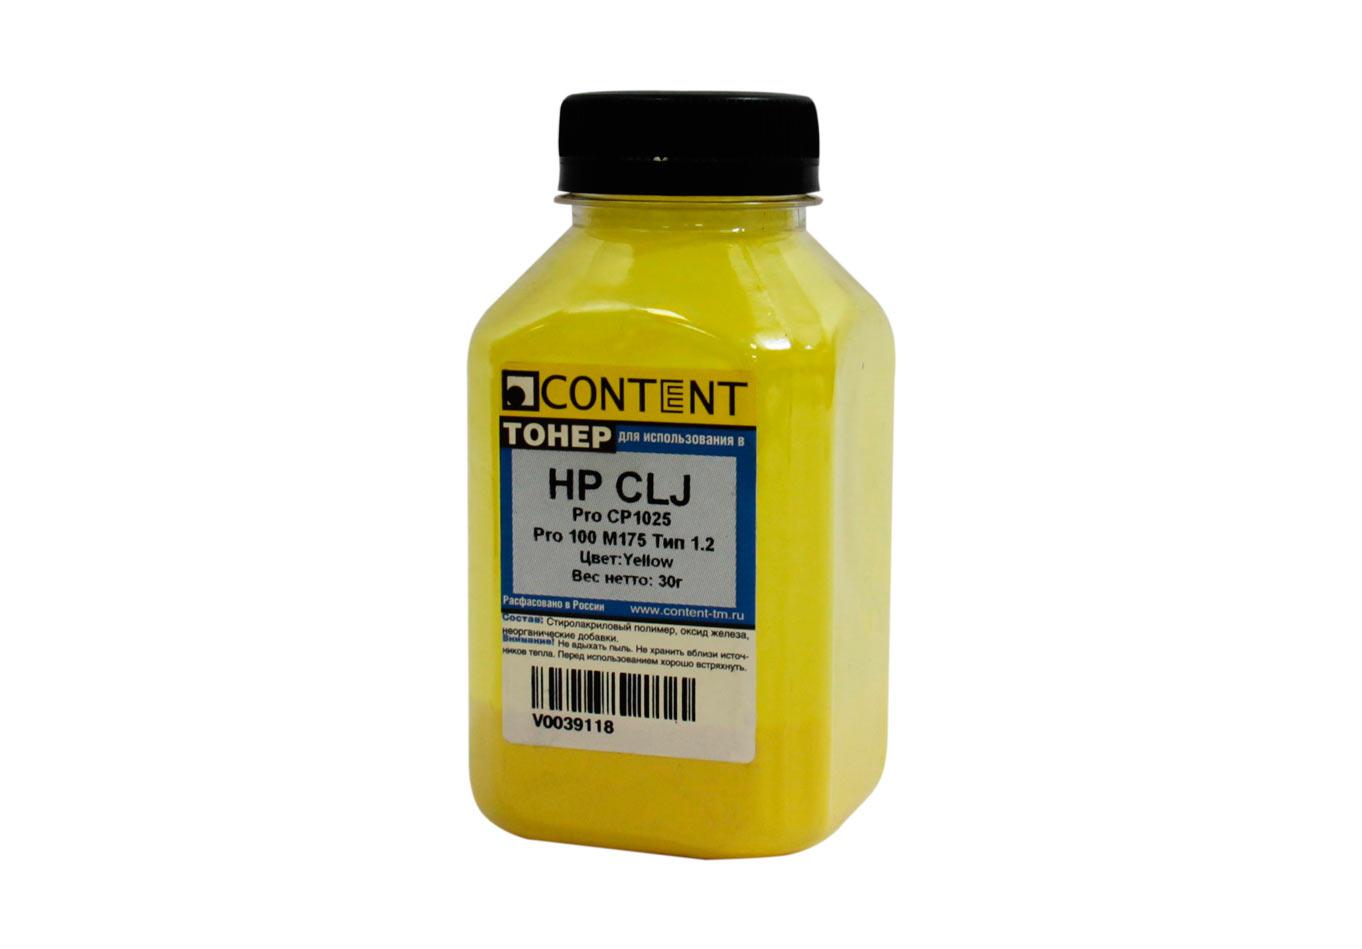 Тонер Content для HP CLJ Pro CP1025/Pro 100 M175, Тип 1.2, Y, 30 г, банка